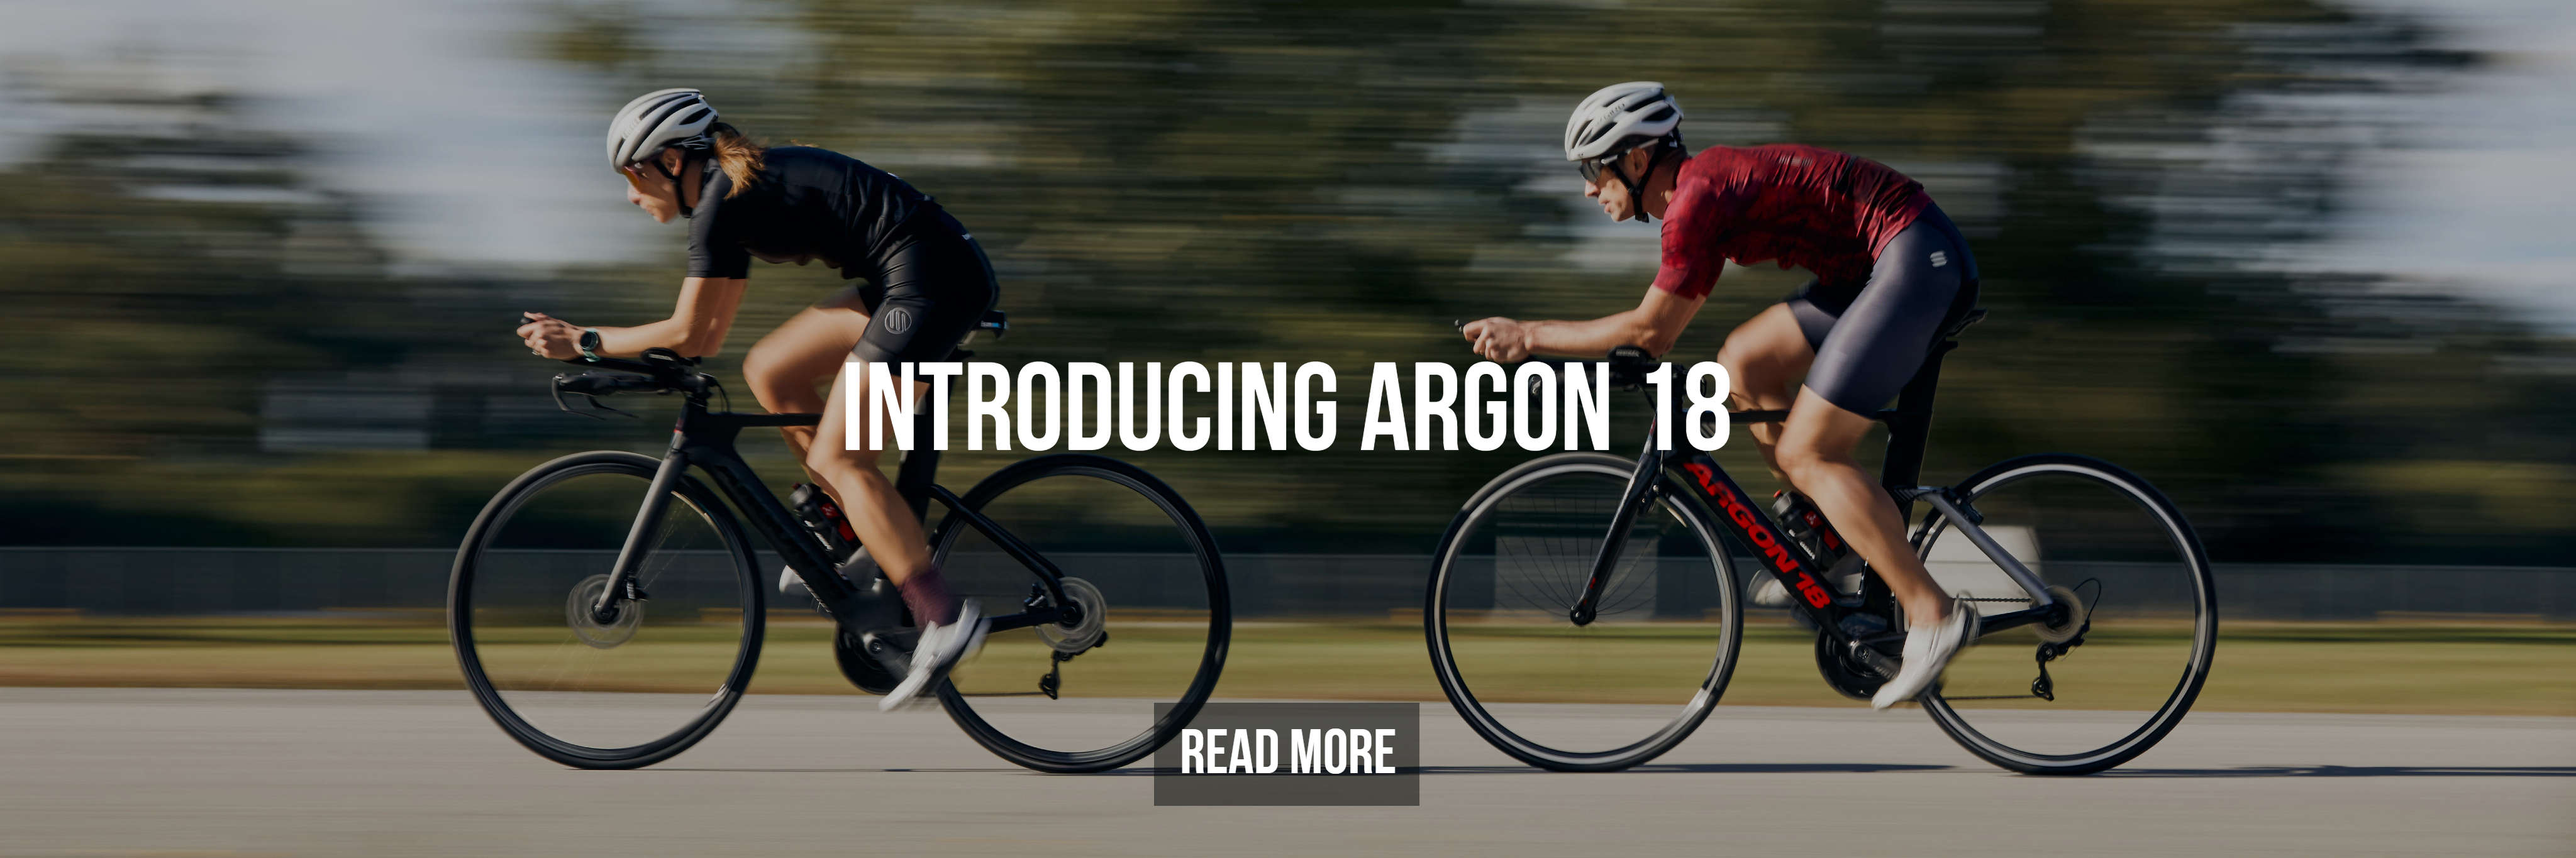 Introducing Argon 18